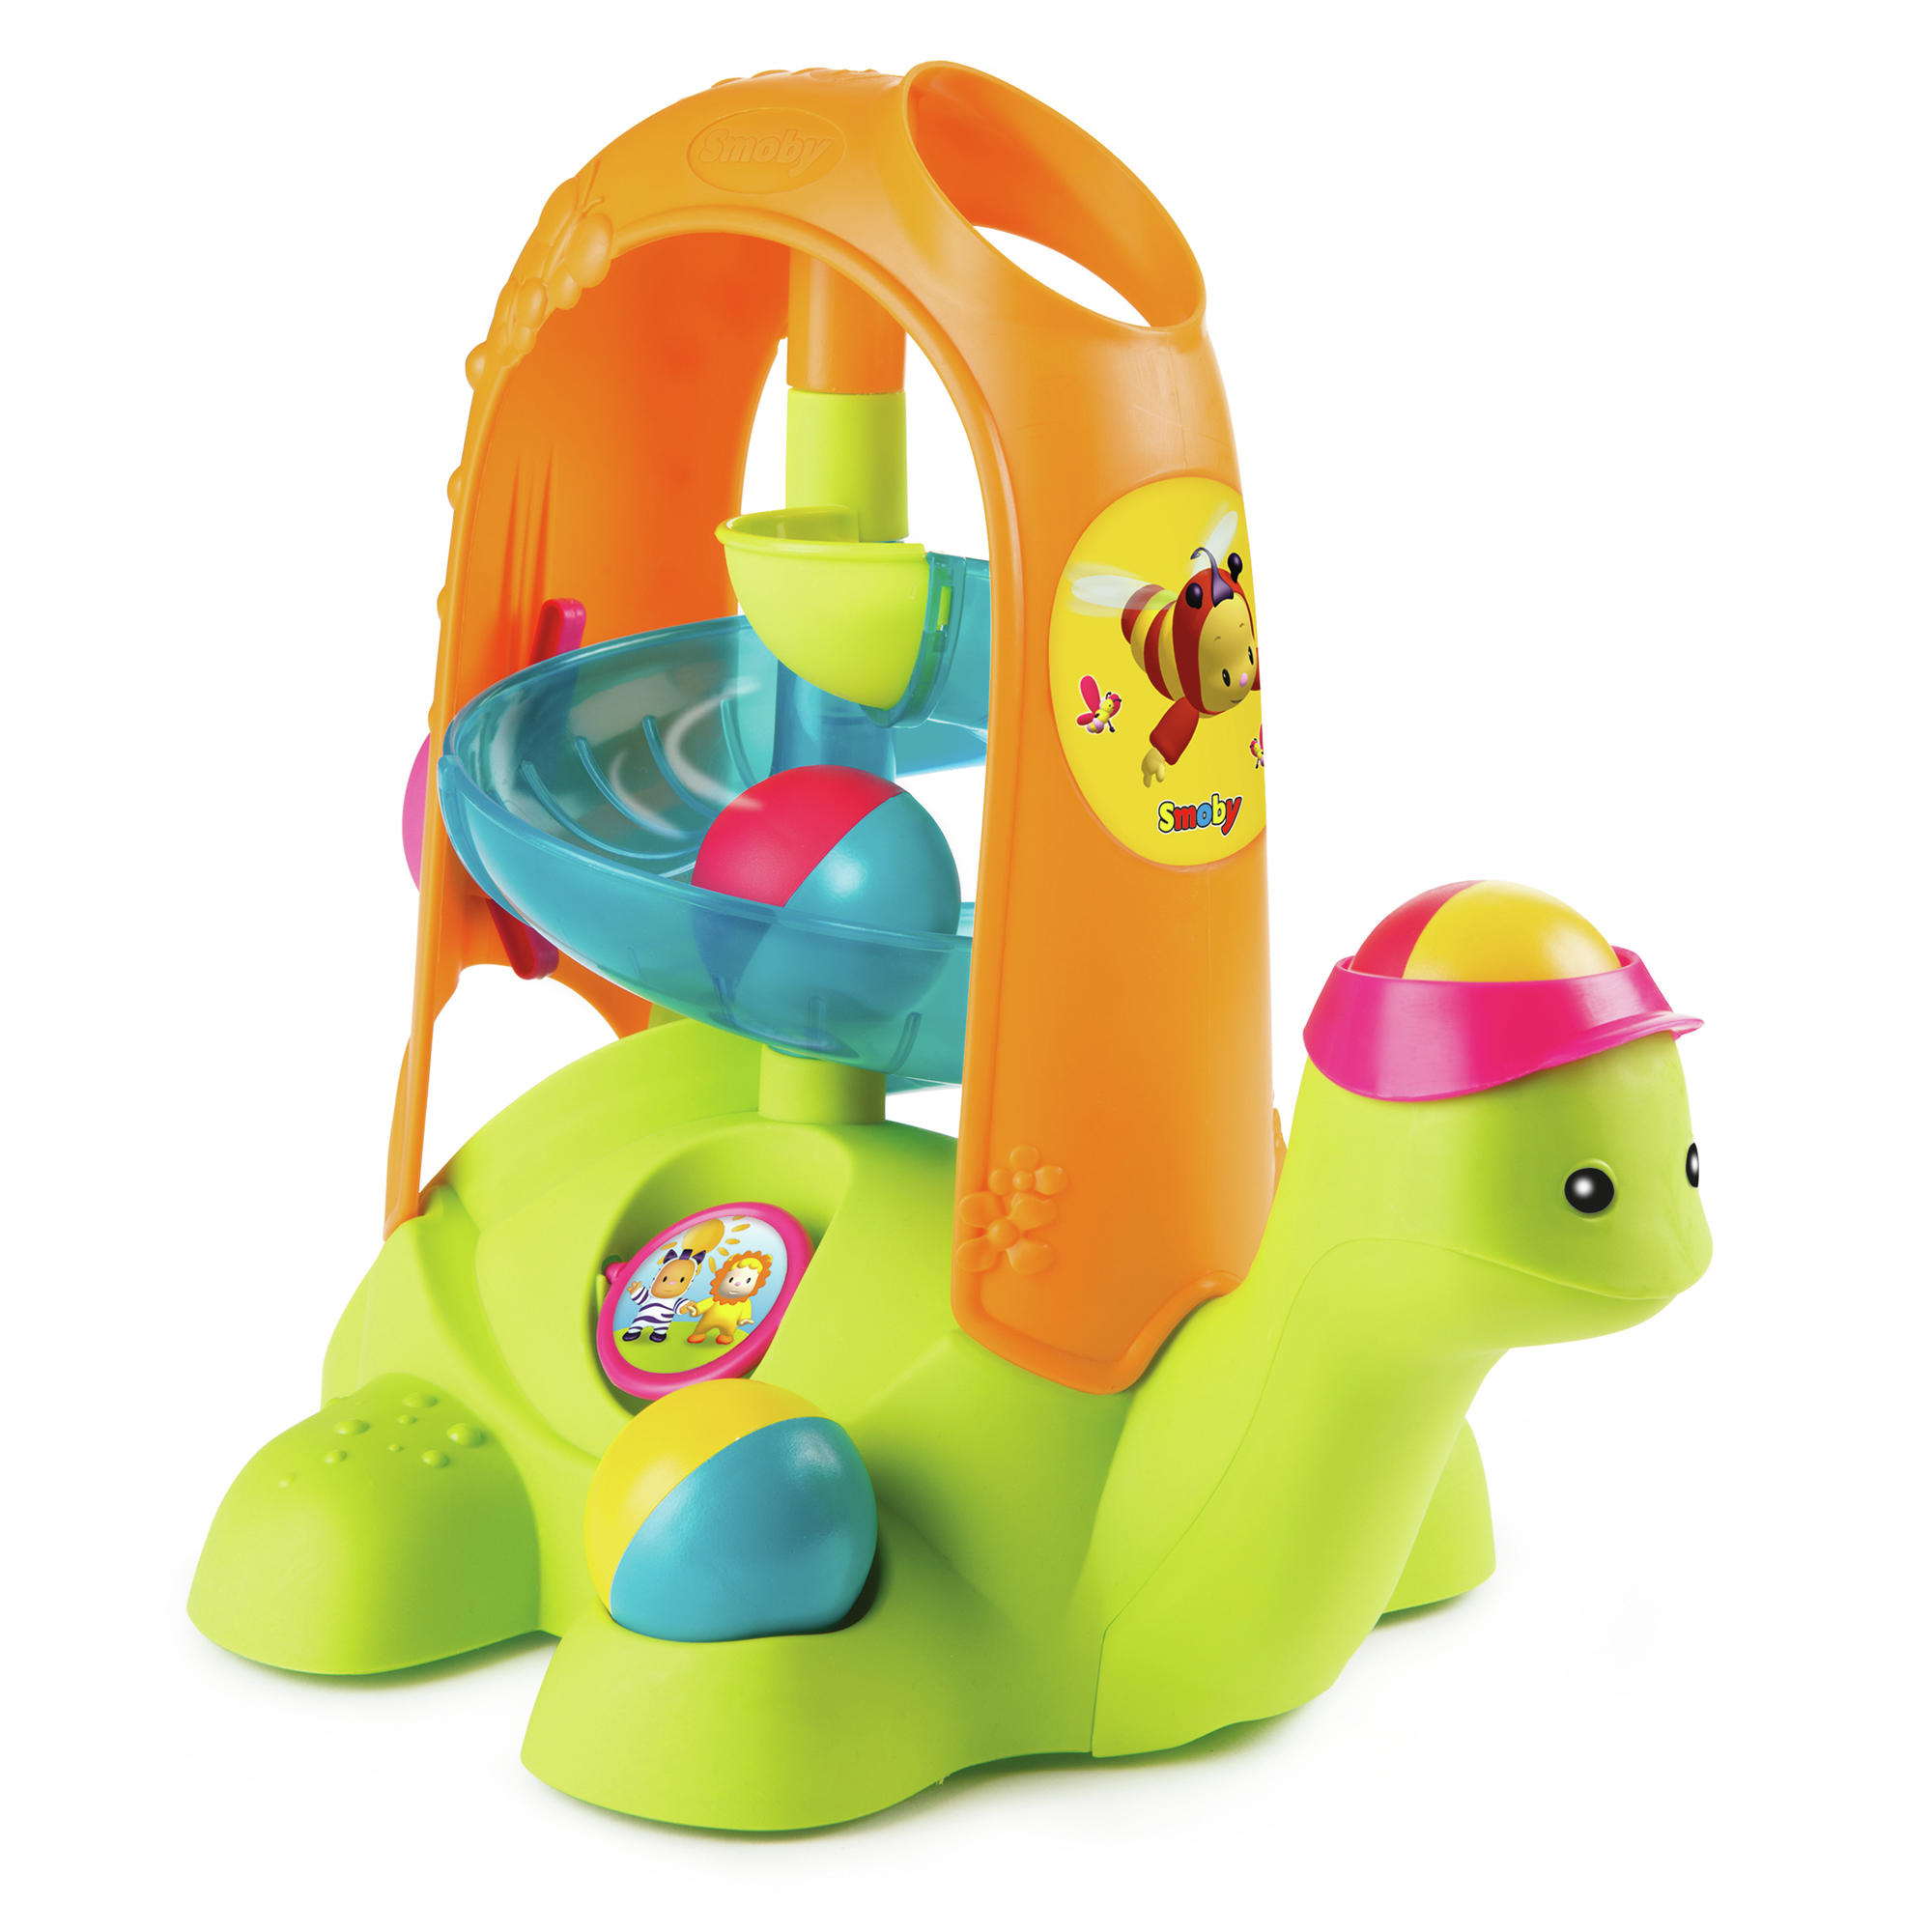 2a74831833750e Cotoons ballenbaan schildpad SMOBY - Babyspeelgoed - UNIGRO.be